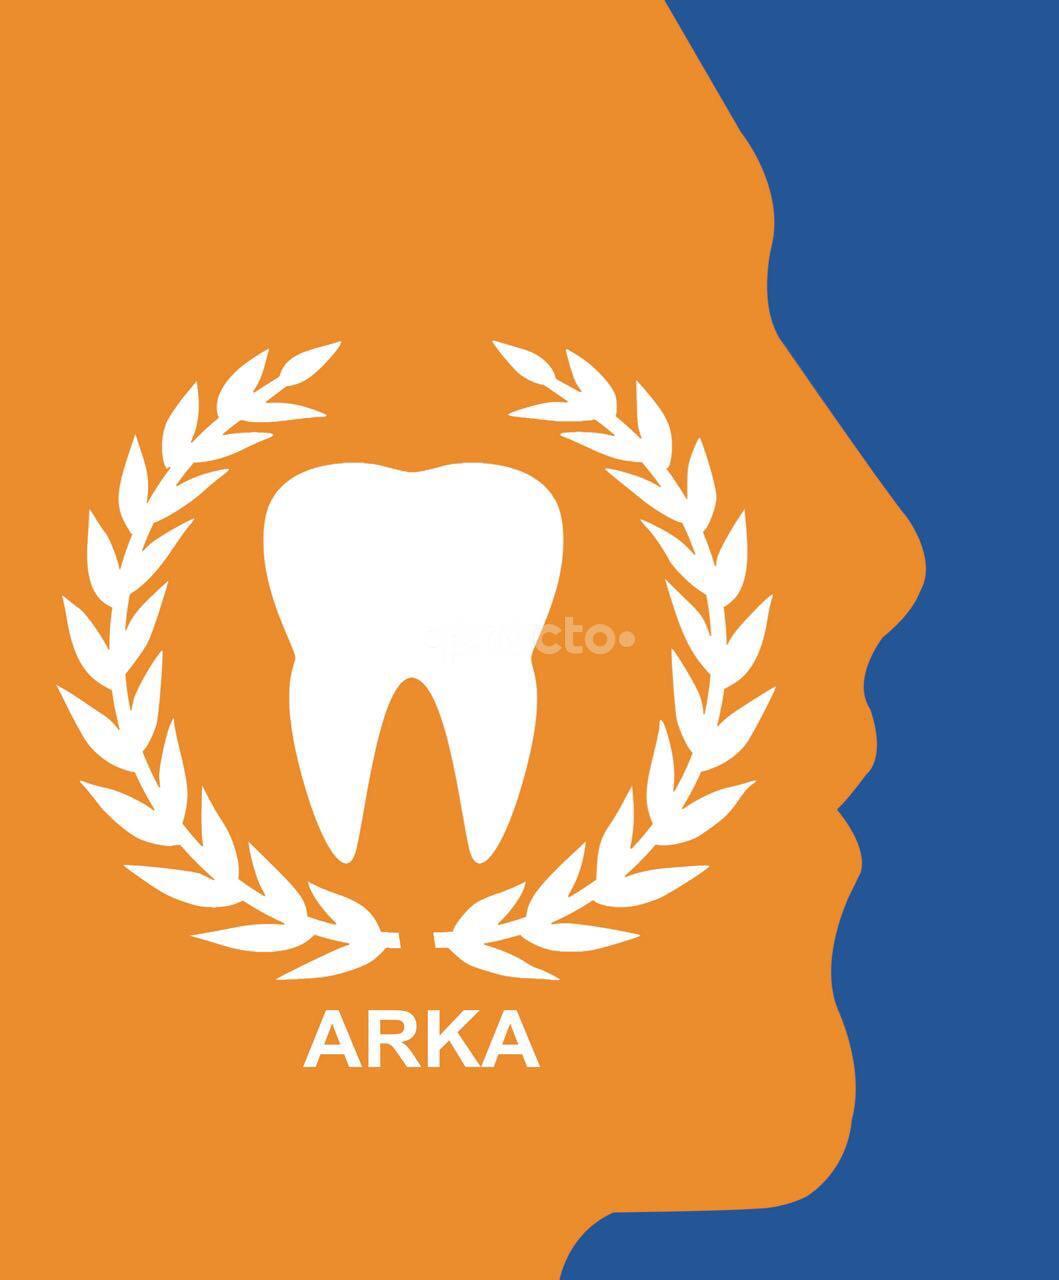 Arka Dental Craniofacial Hospital